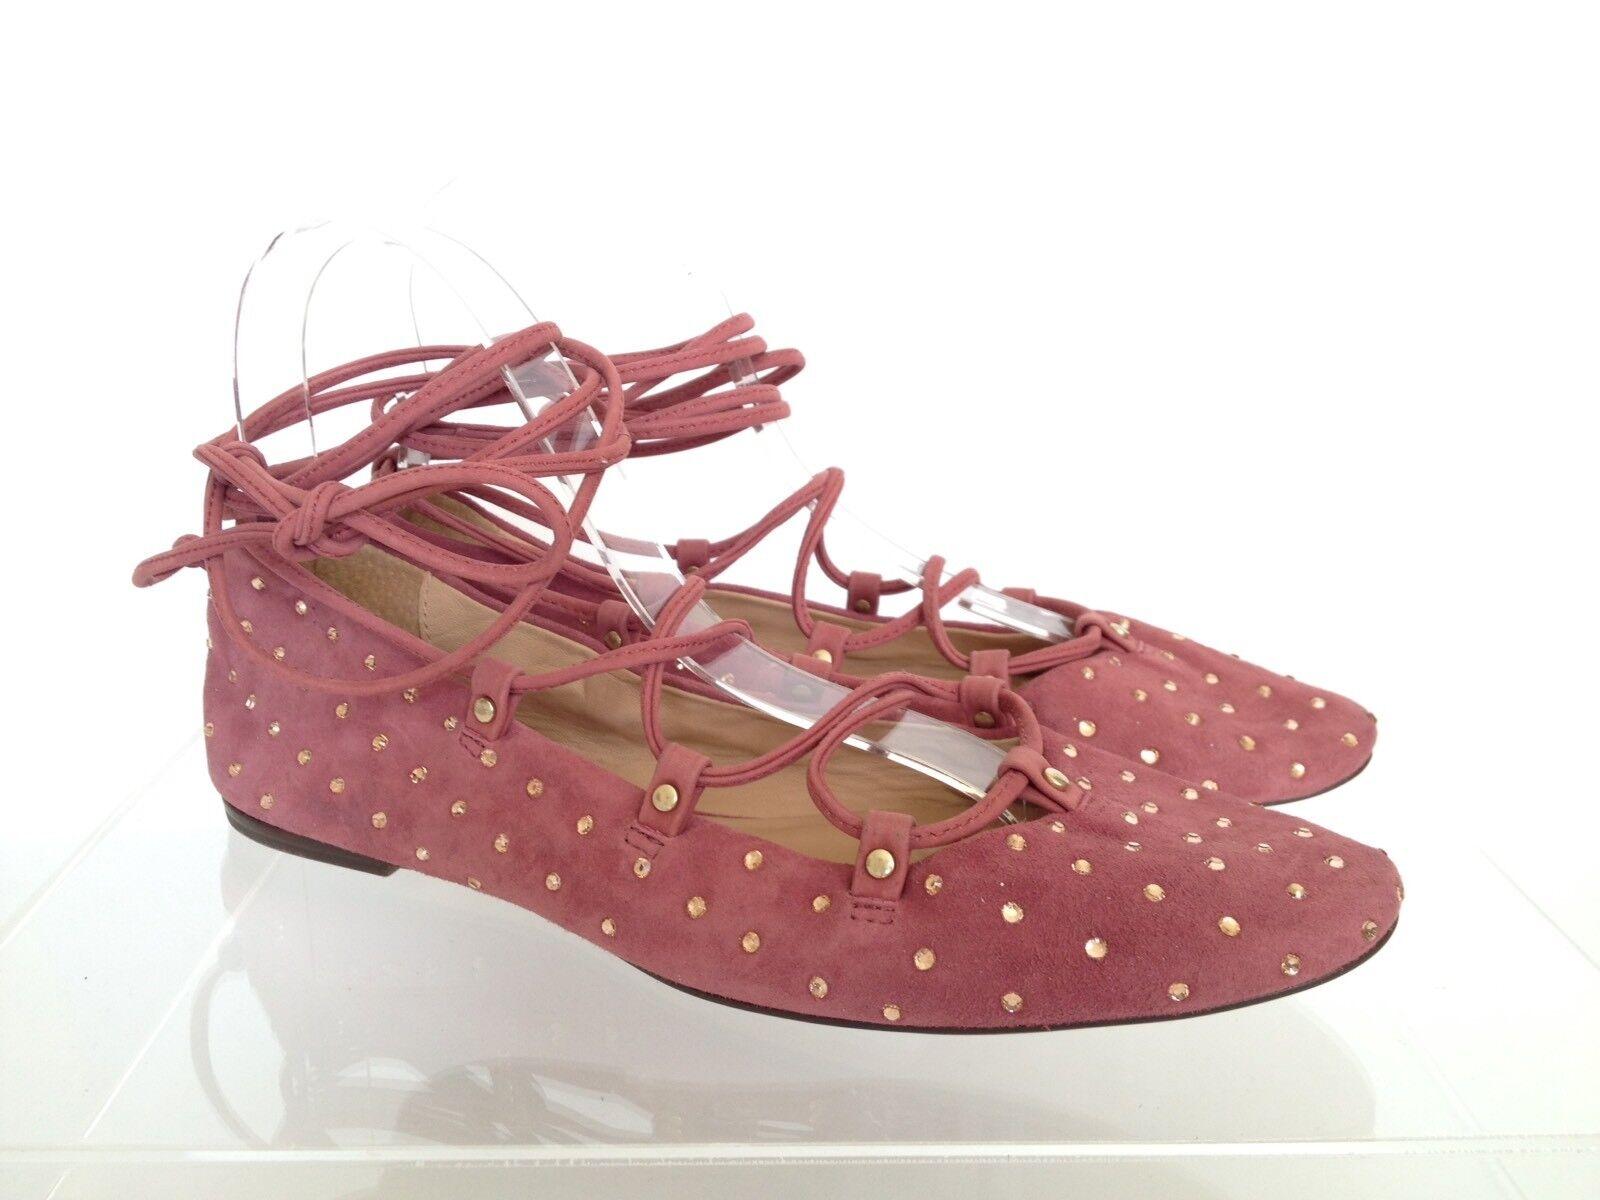 J.CREW Studded Suede Lace-up Ballet Flats 7 Pale Plum Pink e5043  228